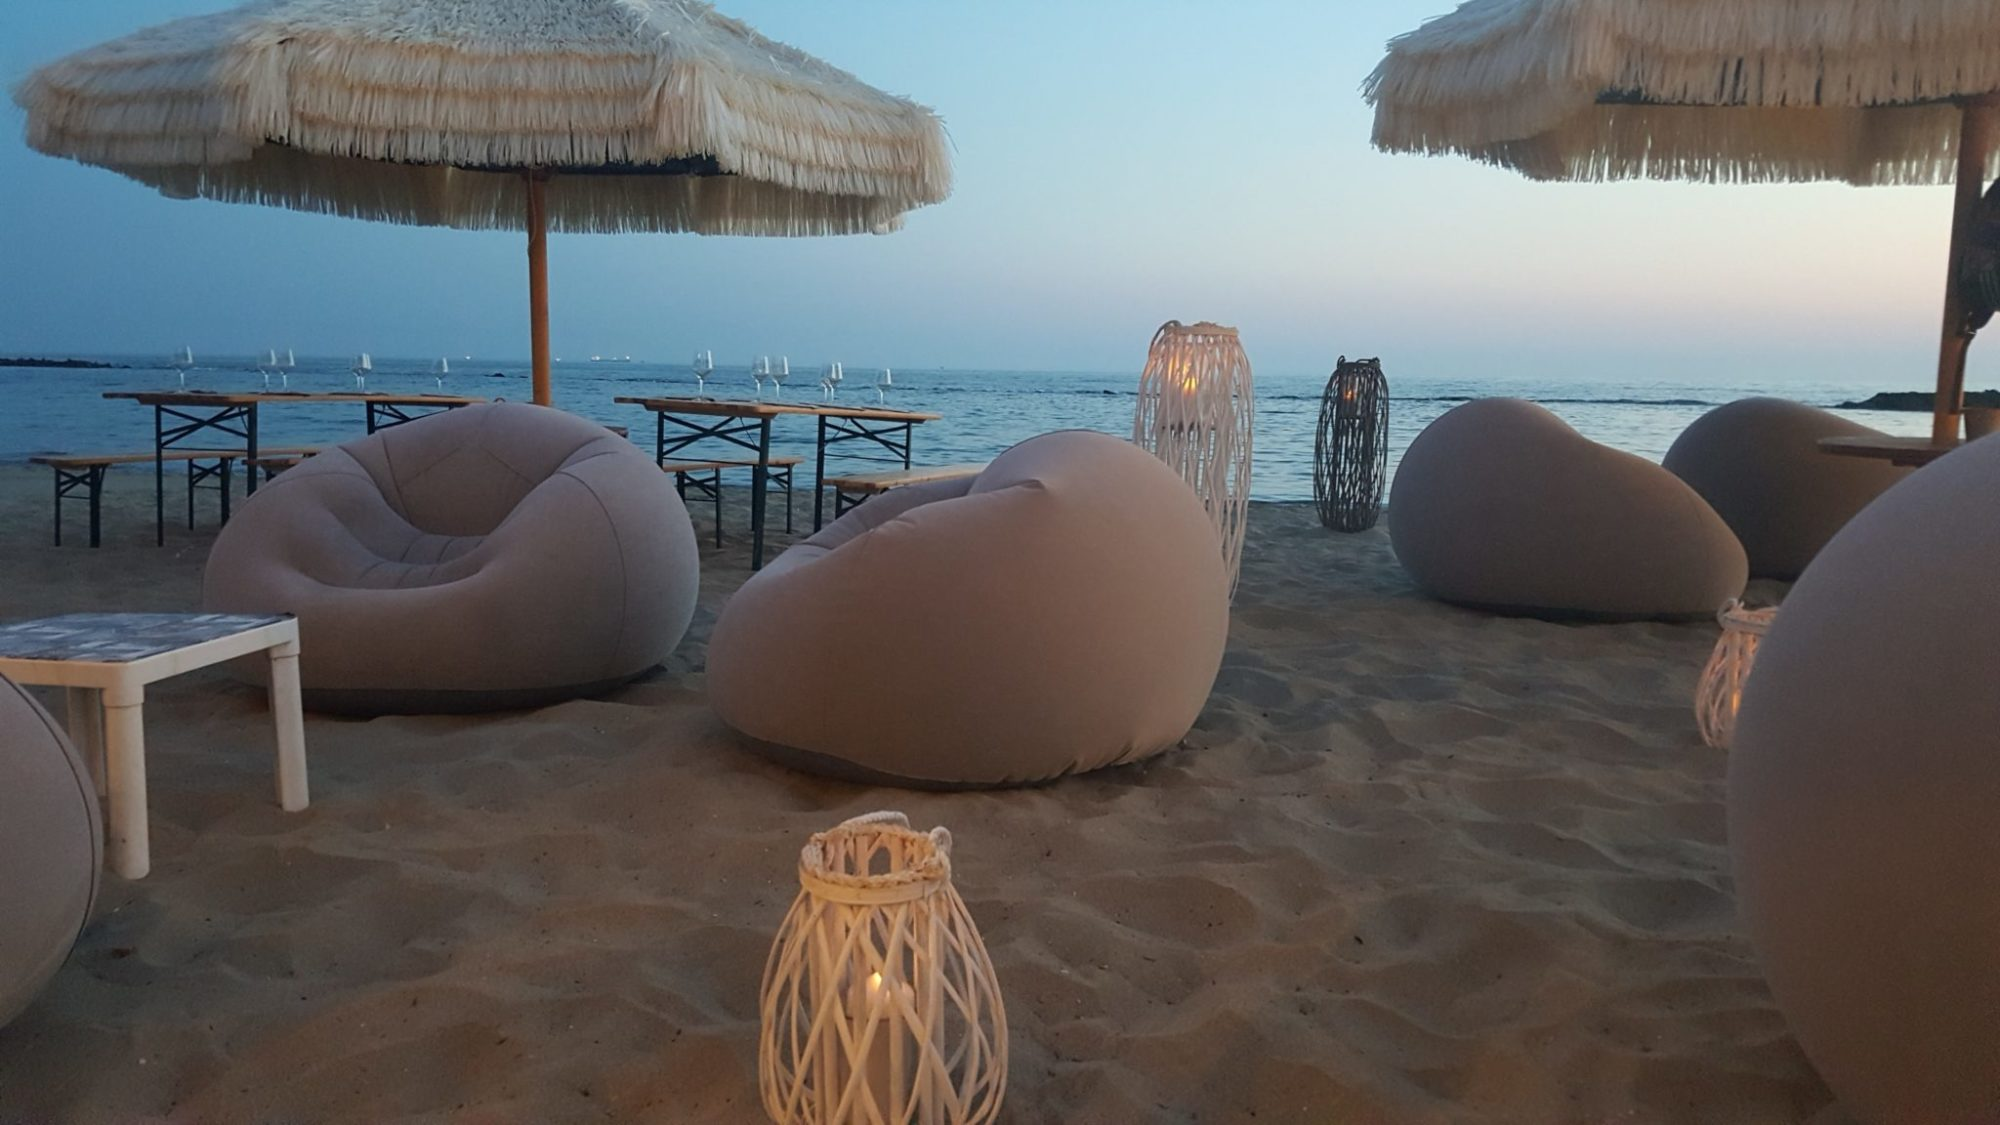 cabiria slow beach